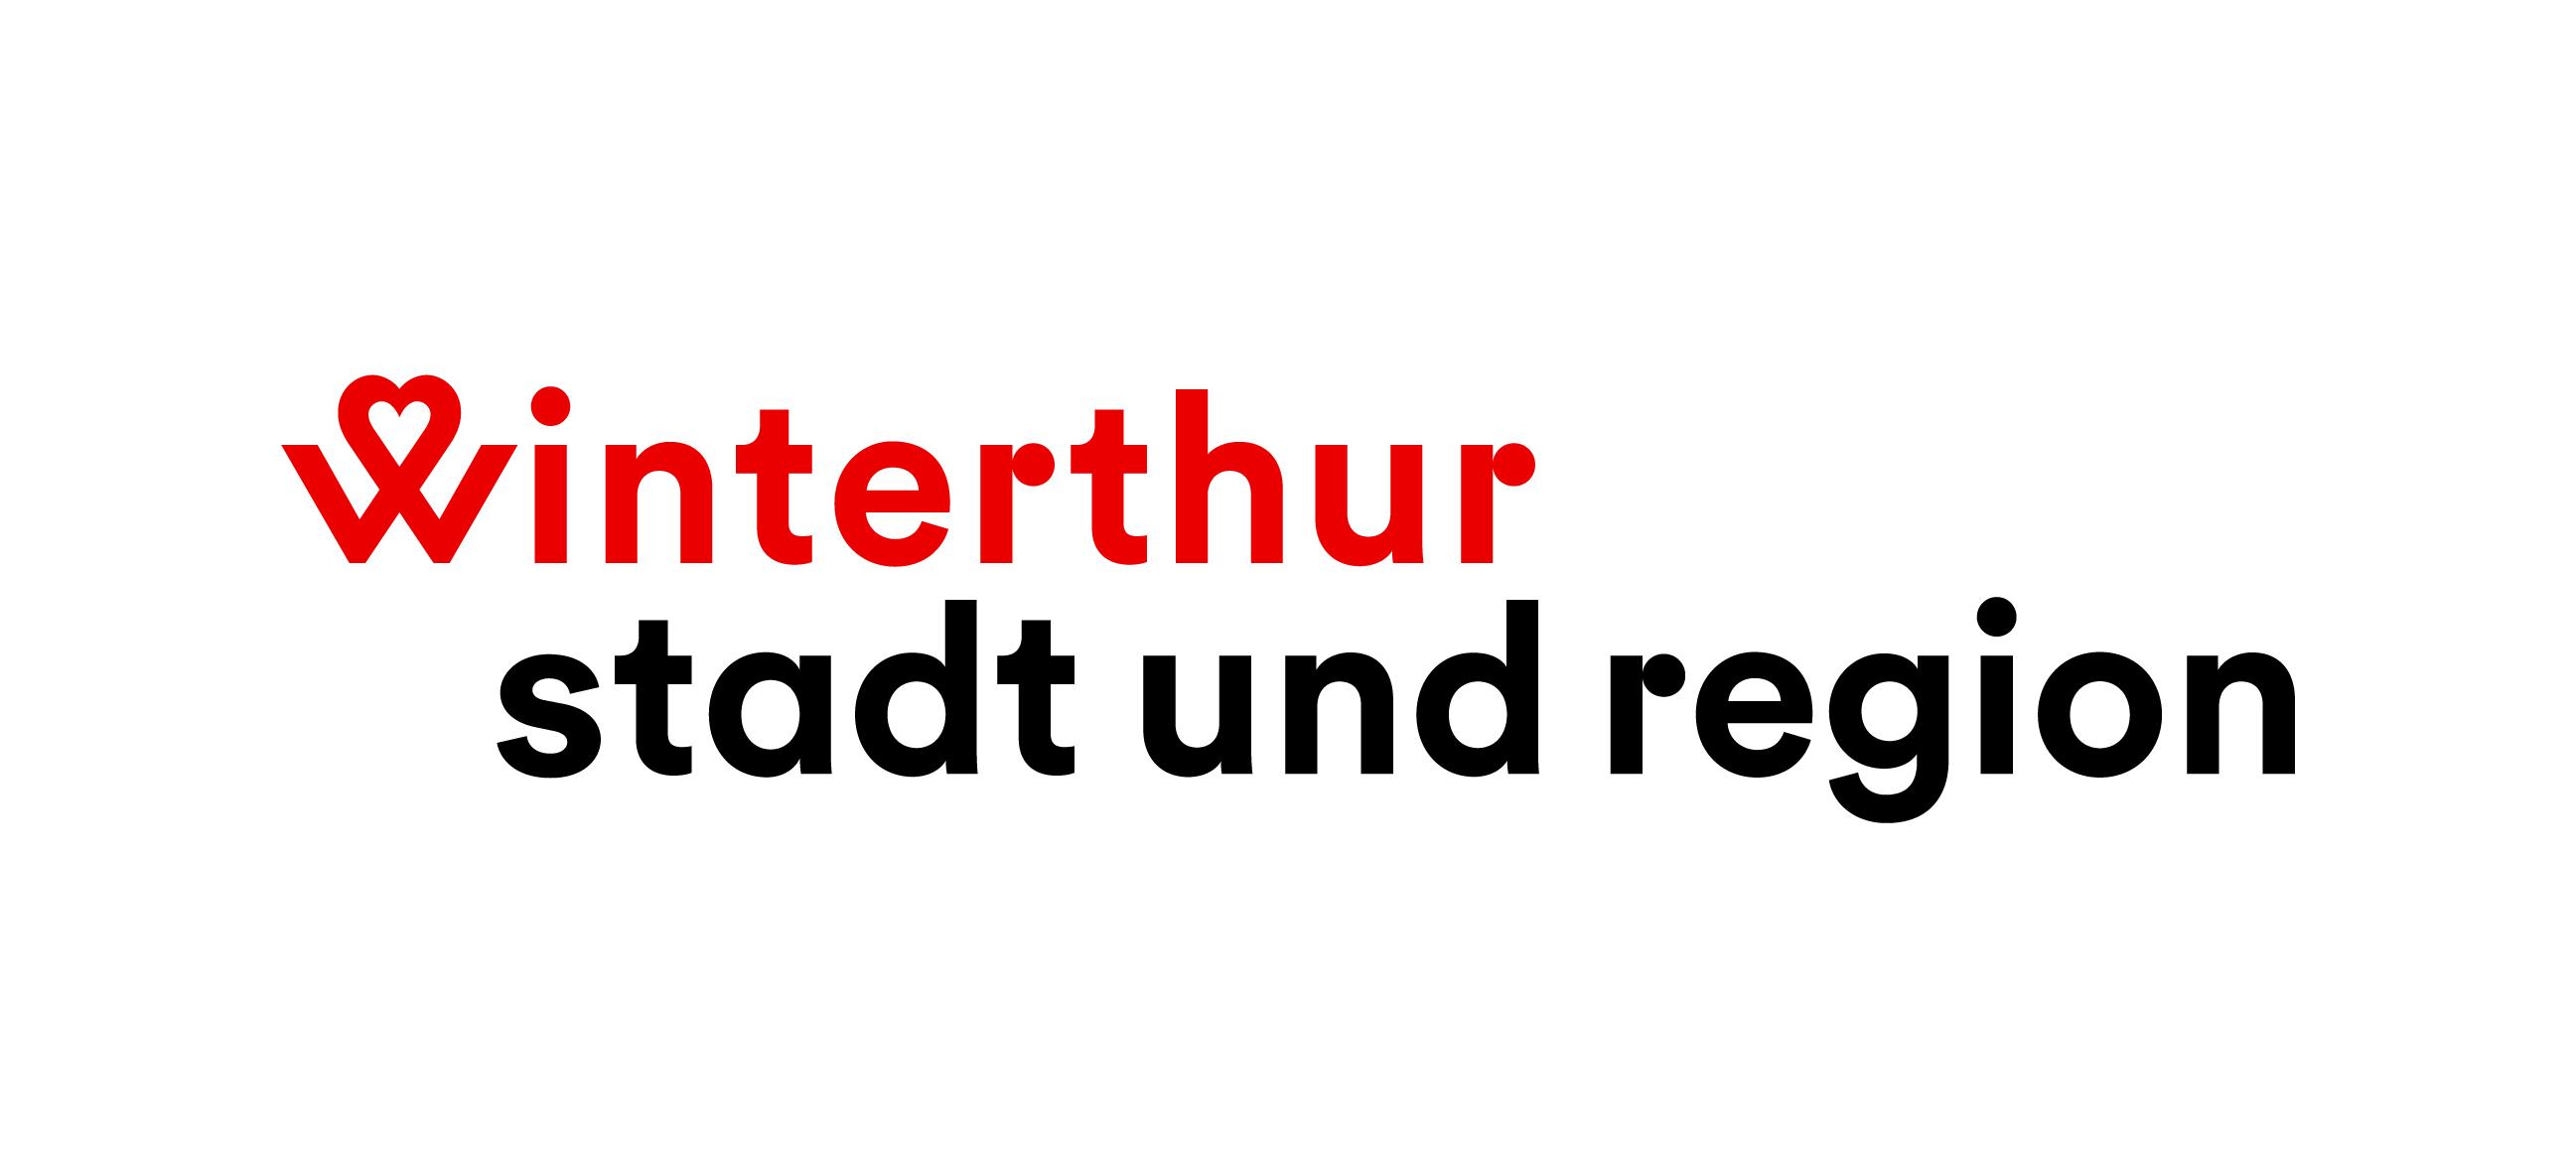 http://campaign-image.eu/zohocampaigns/9597000001628174_winterthur_stadt_region_rgb_3.jpg